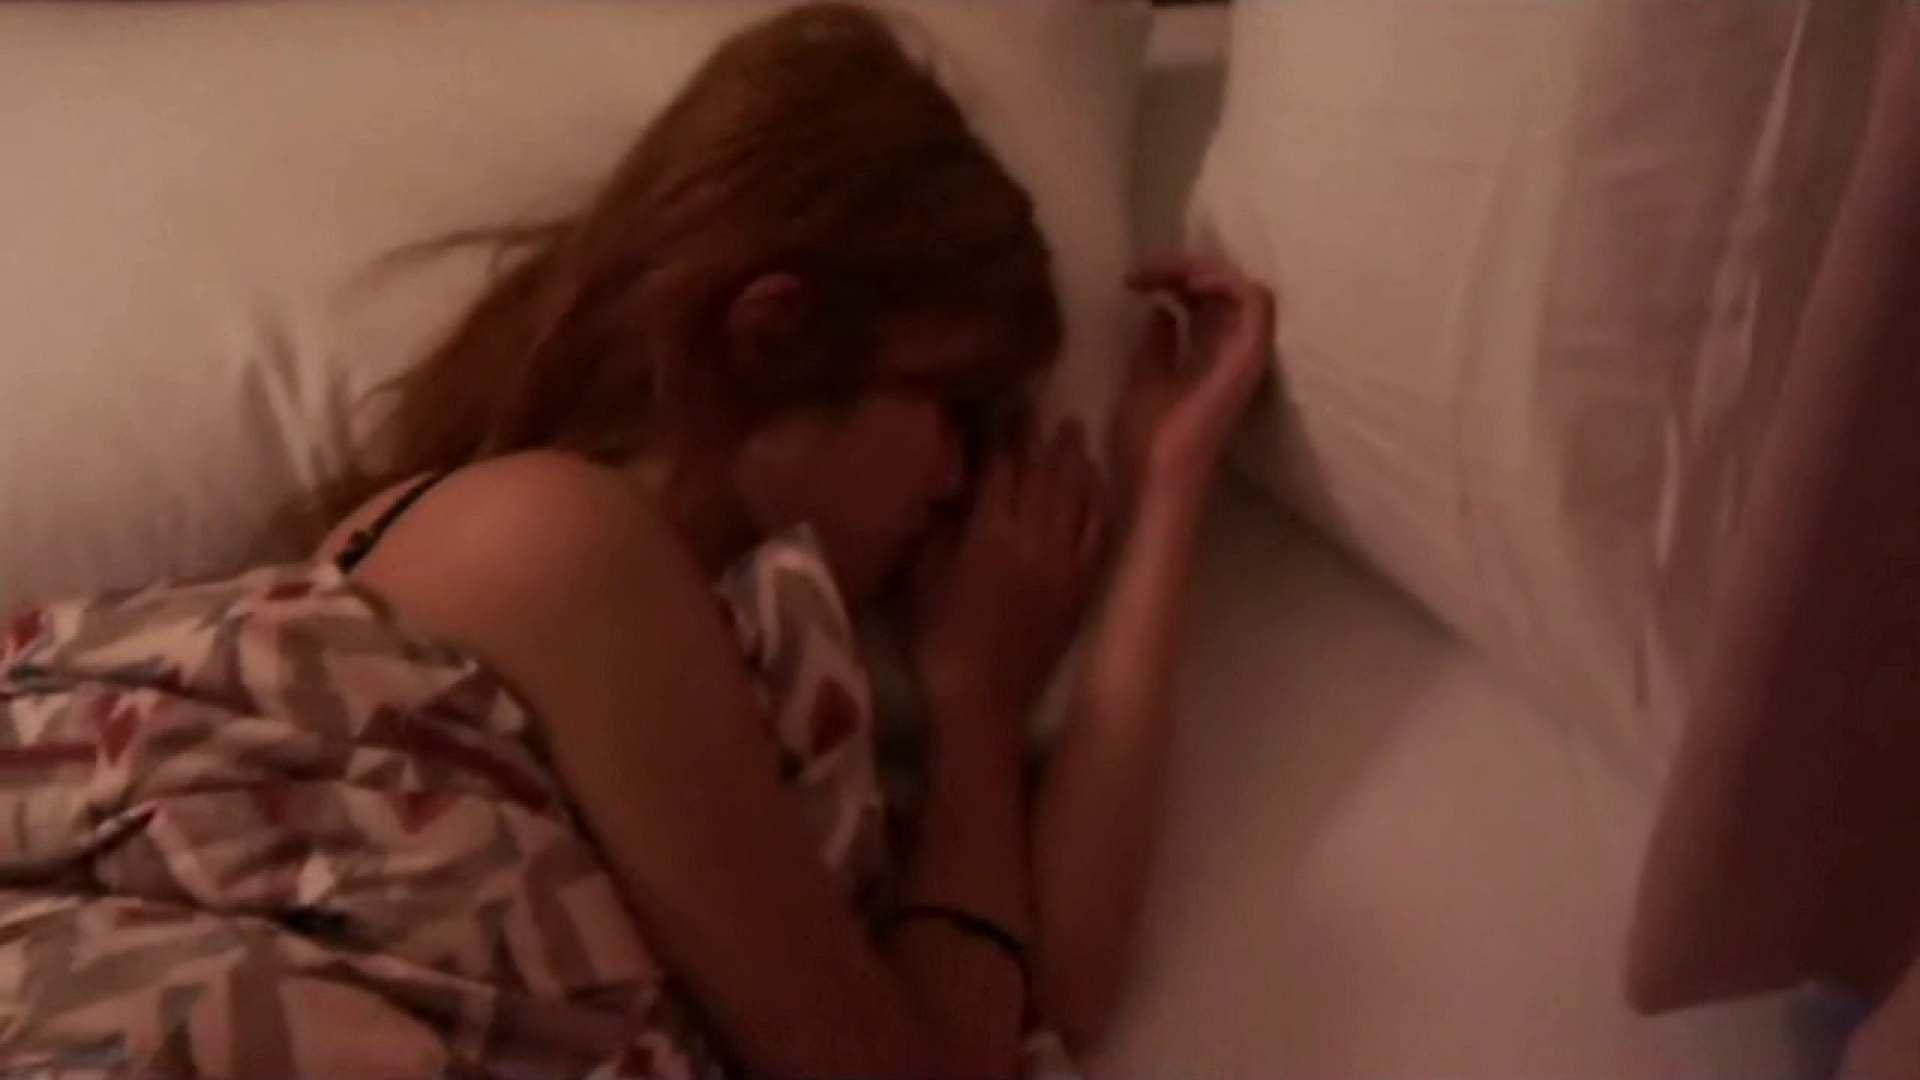 vol.2 【Yちゃん】当時女子大生 帰省した夏の夜 知人 盗撮オマンコ無修正動画無料 50pic 29